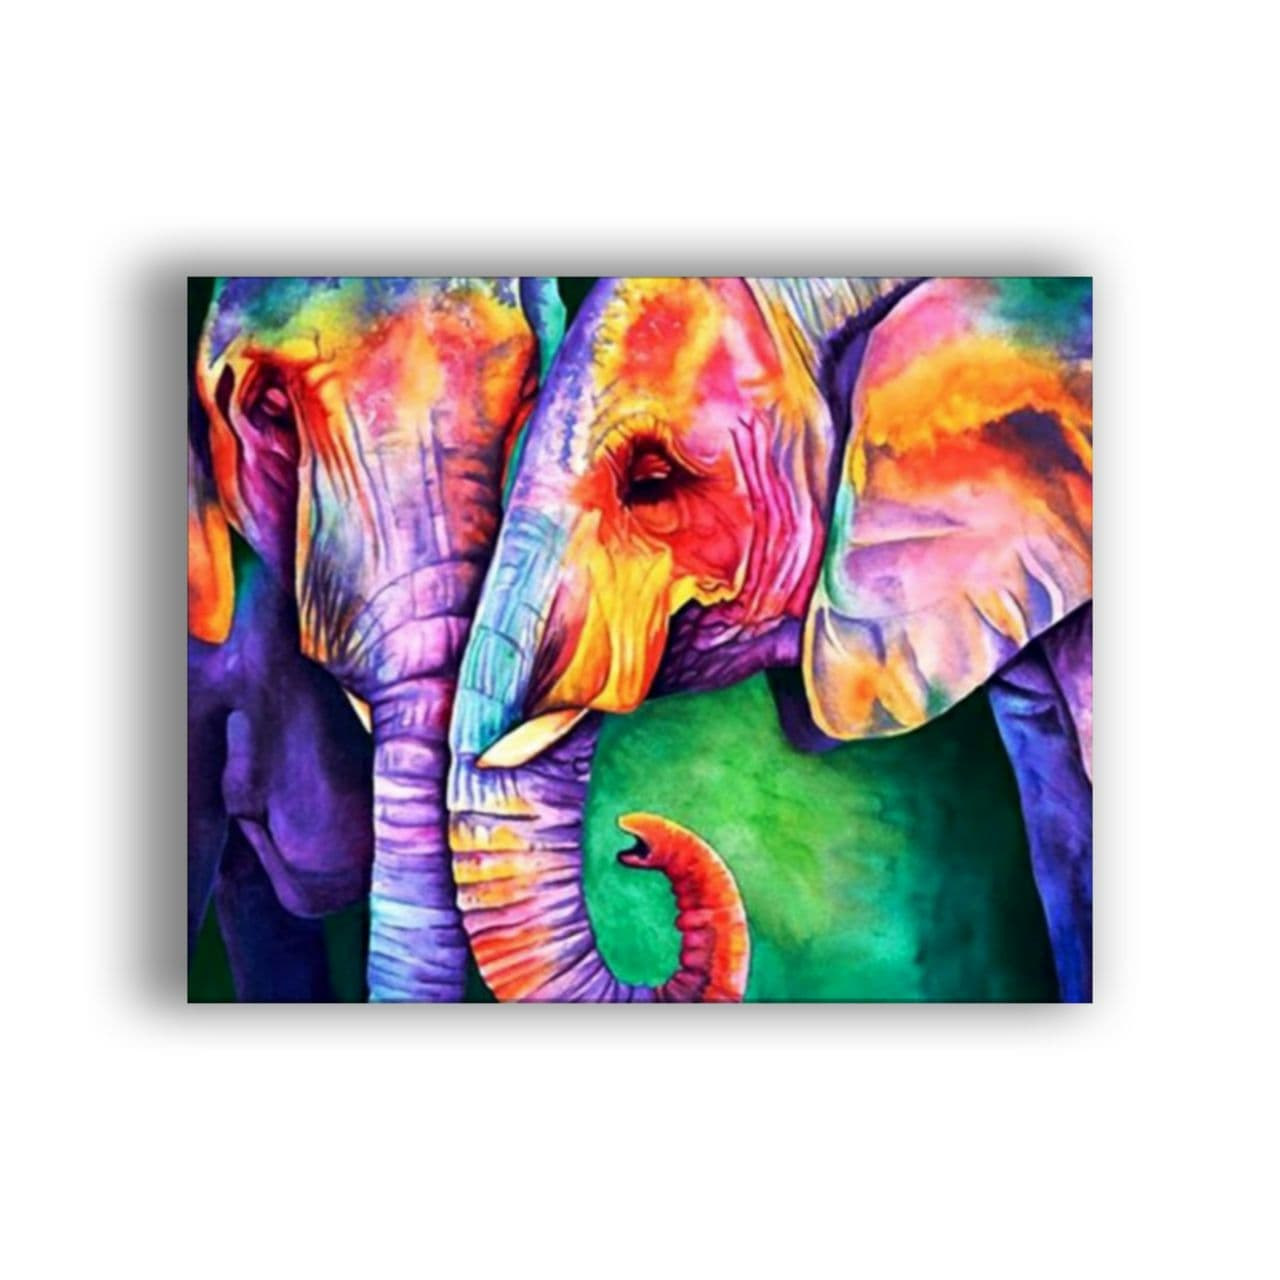 two elephants colored